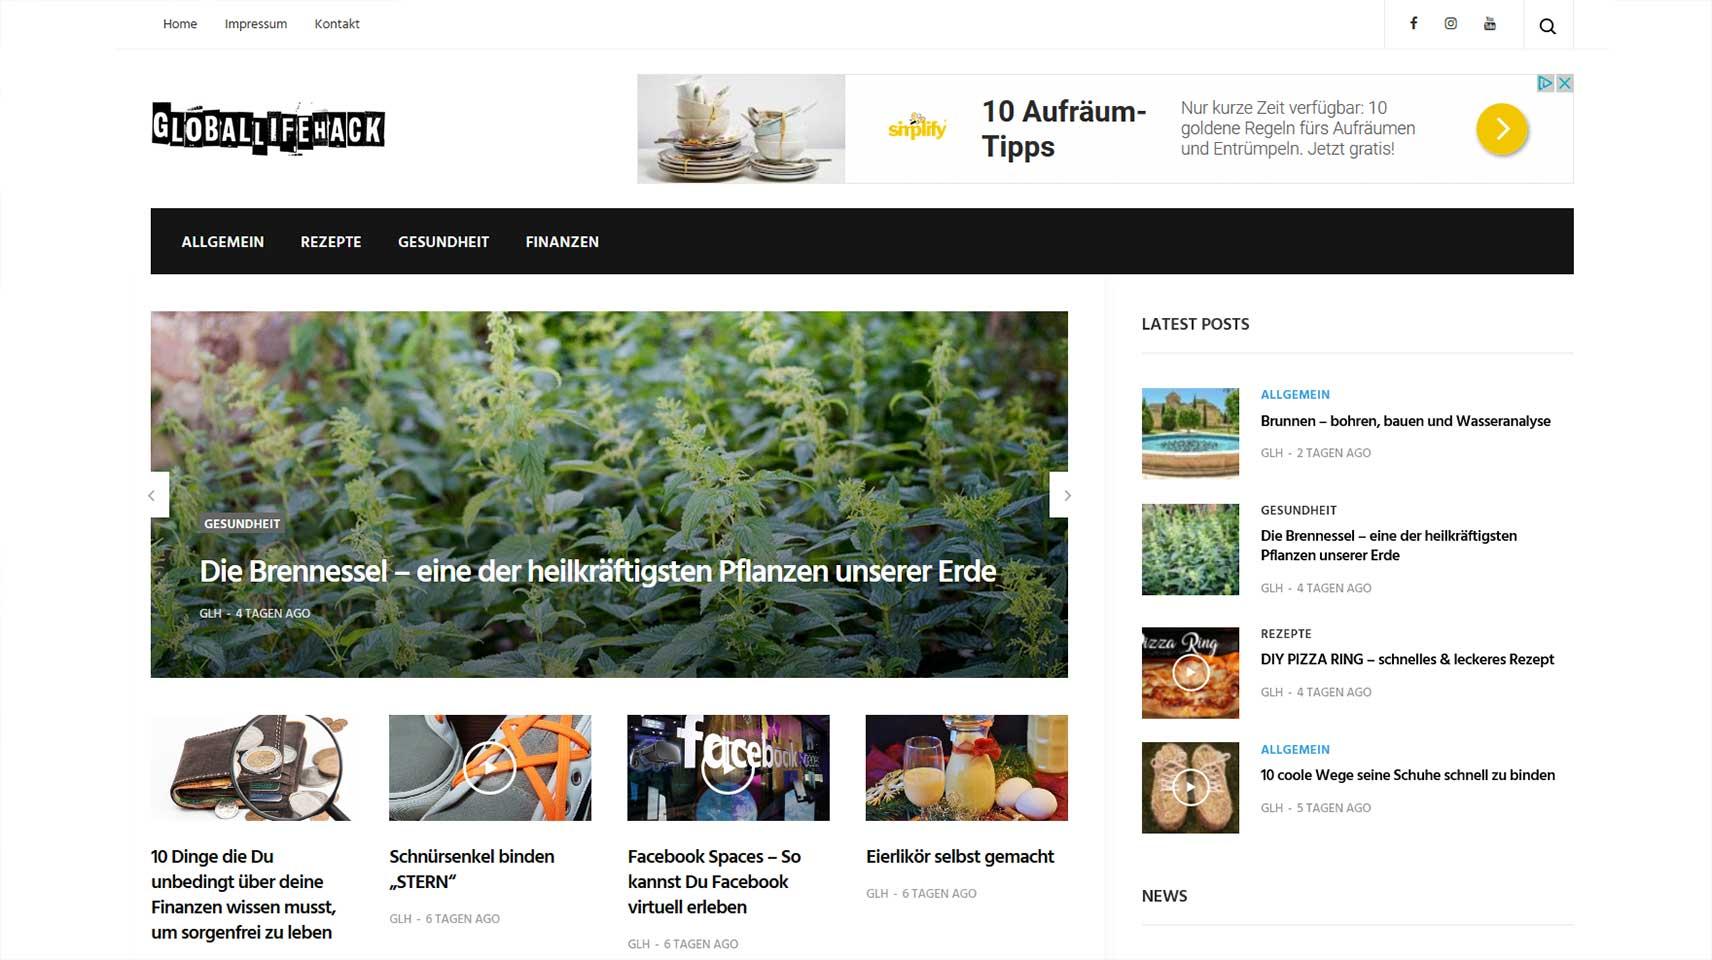 GlobalLifeHack-webseite